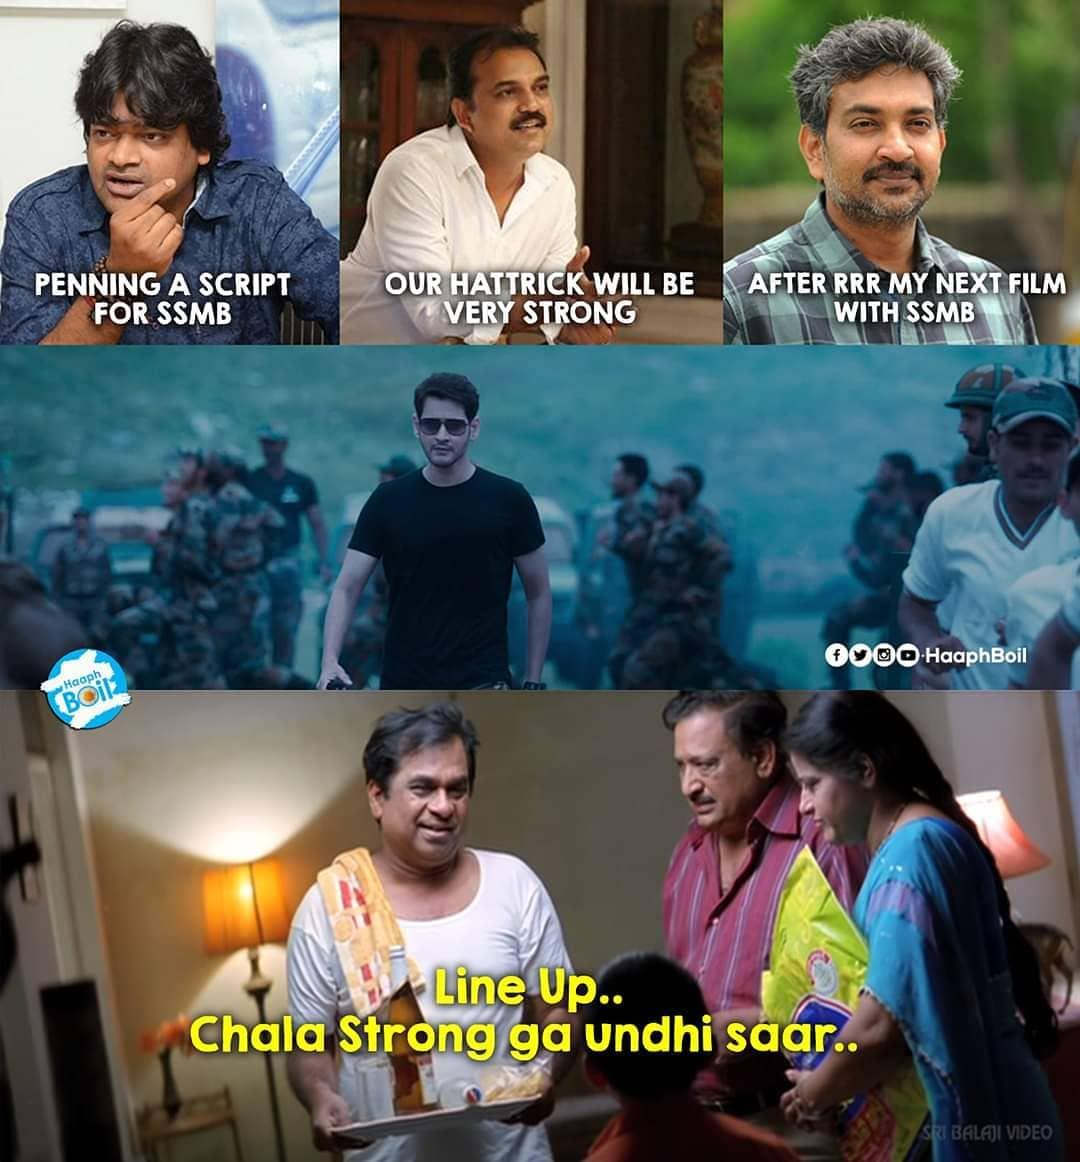 15. Mahesh Babu And Ss Rajamouli Memes